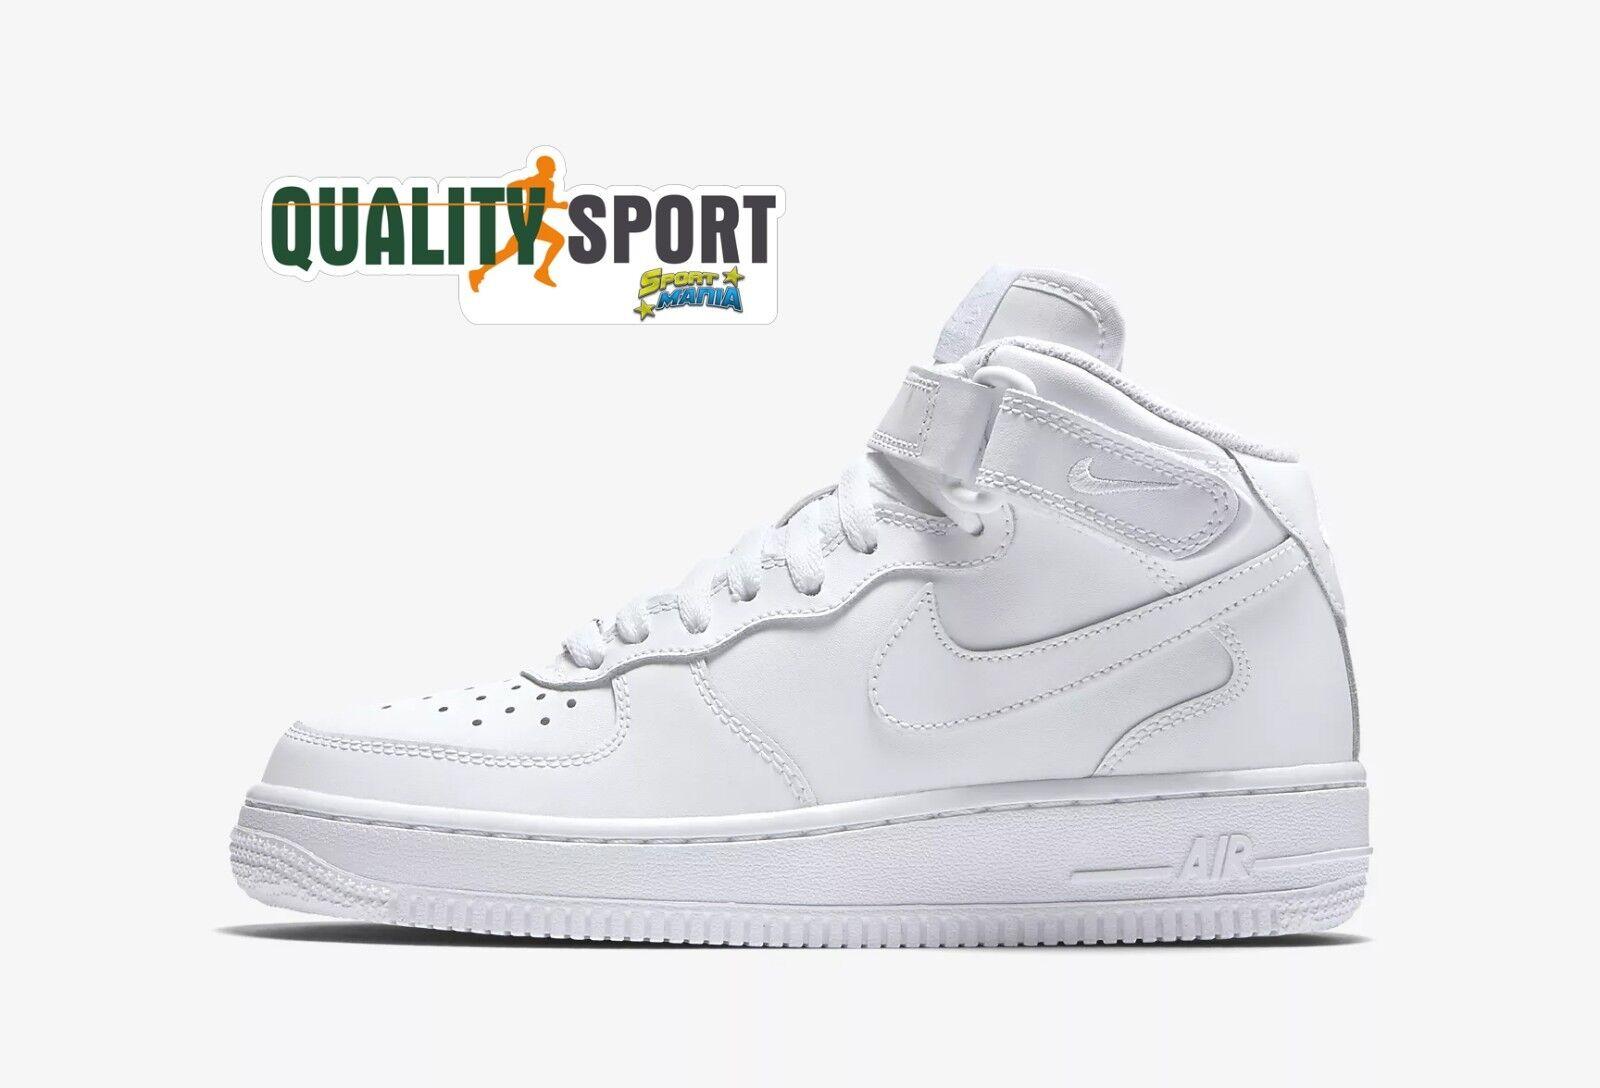 Nike Air Force 1 Mid Scarpe scarpe Donna Ragazzo scarpe da ginnastica 314195 113